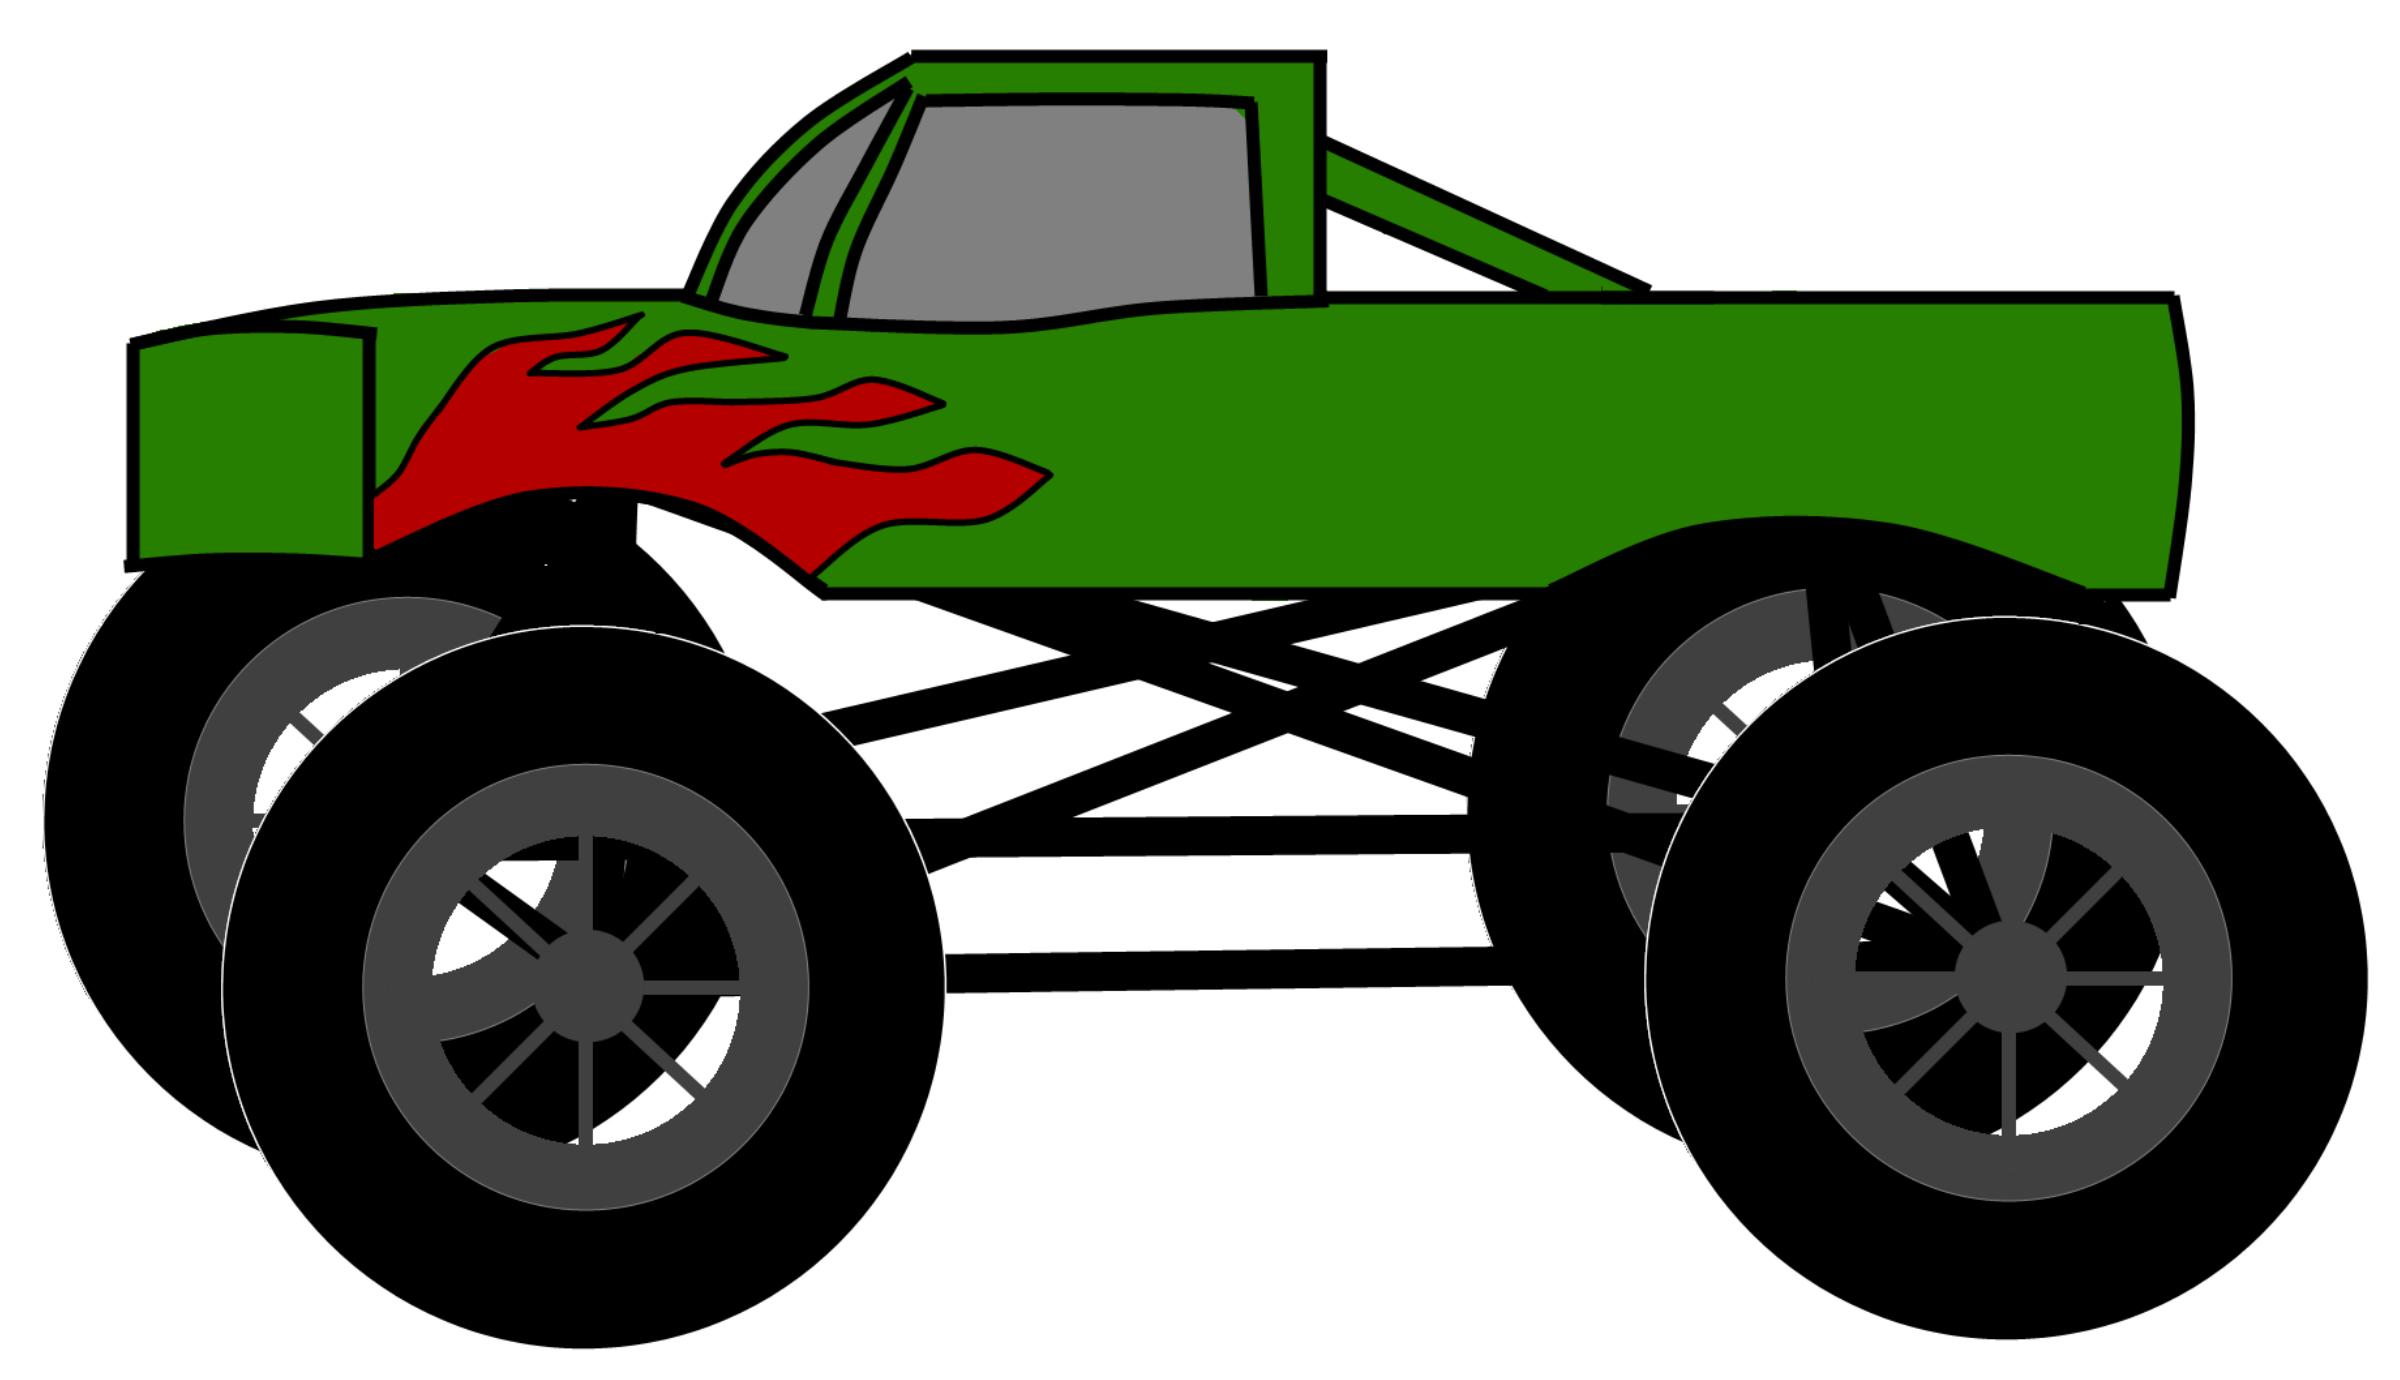 Monster Truck Clip Art Pictures Free Clipart Images Image 24343 Clip Art Pictures Monster Trucks Clip Art